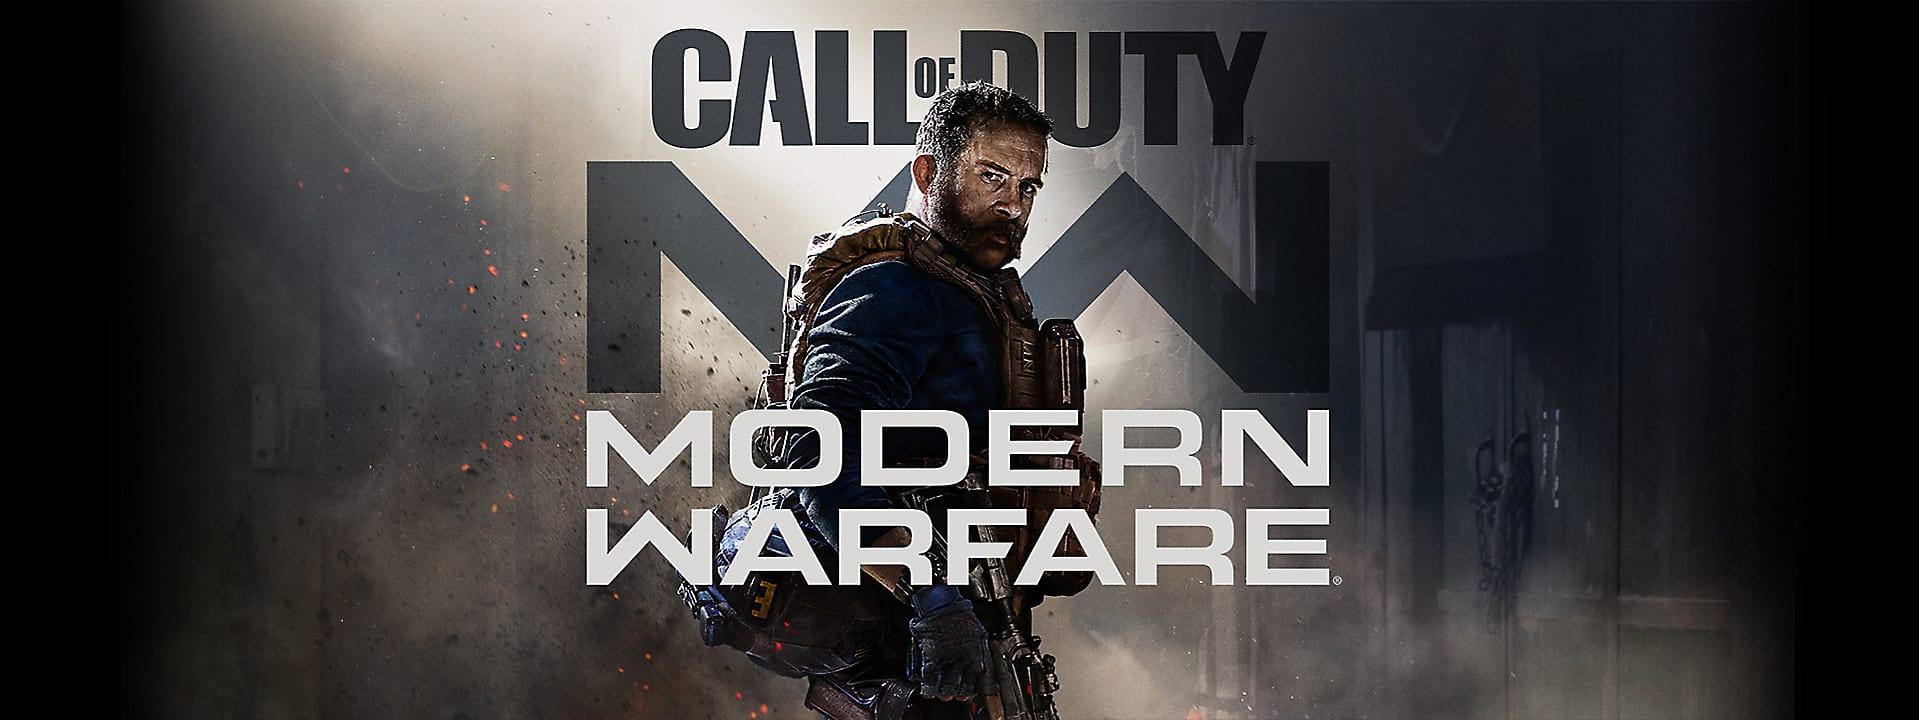 Call of Duty Modern Warfare 2019 update